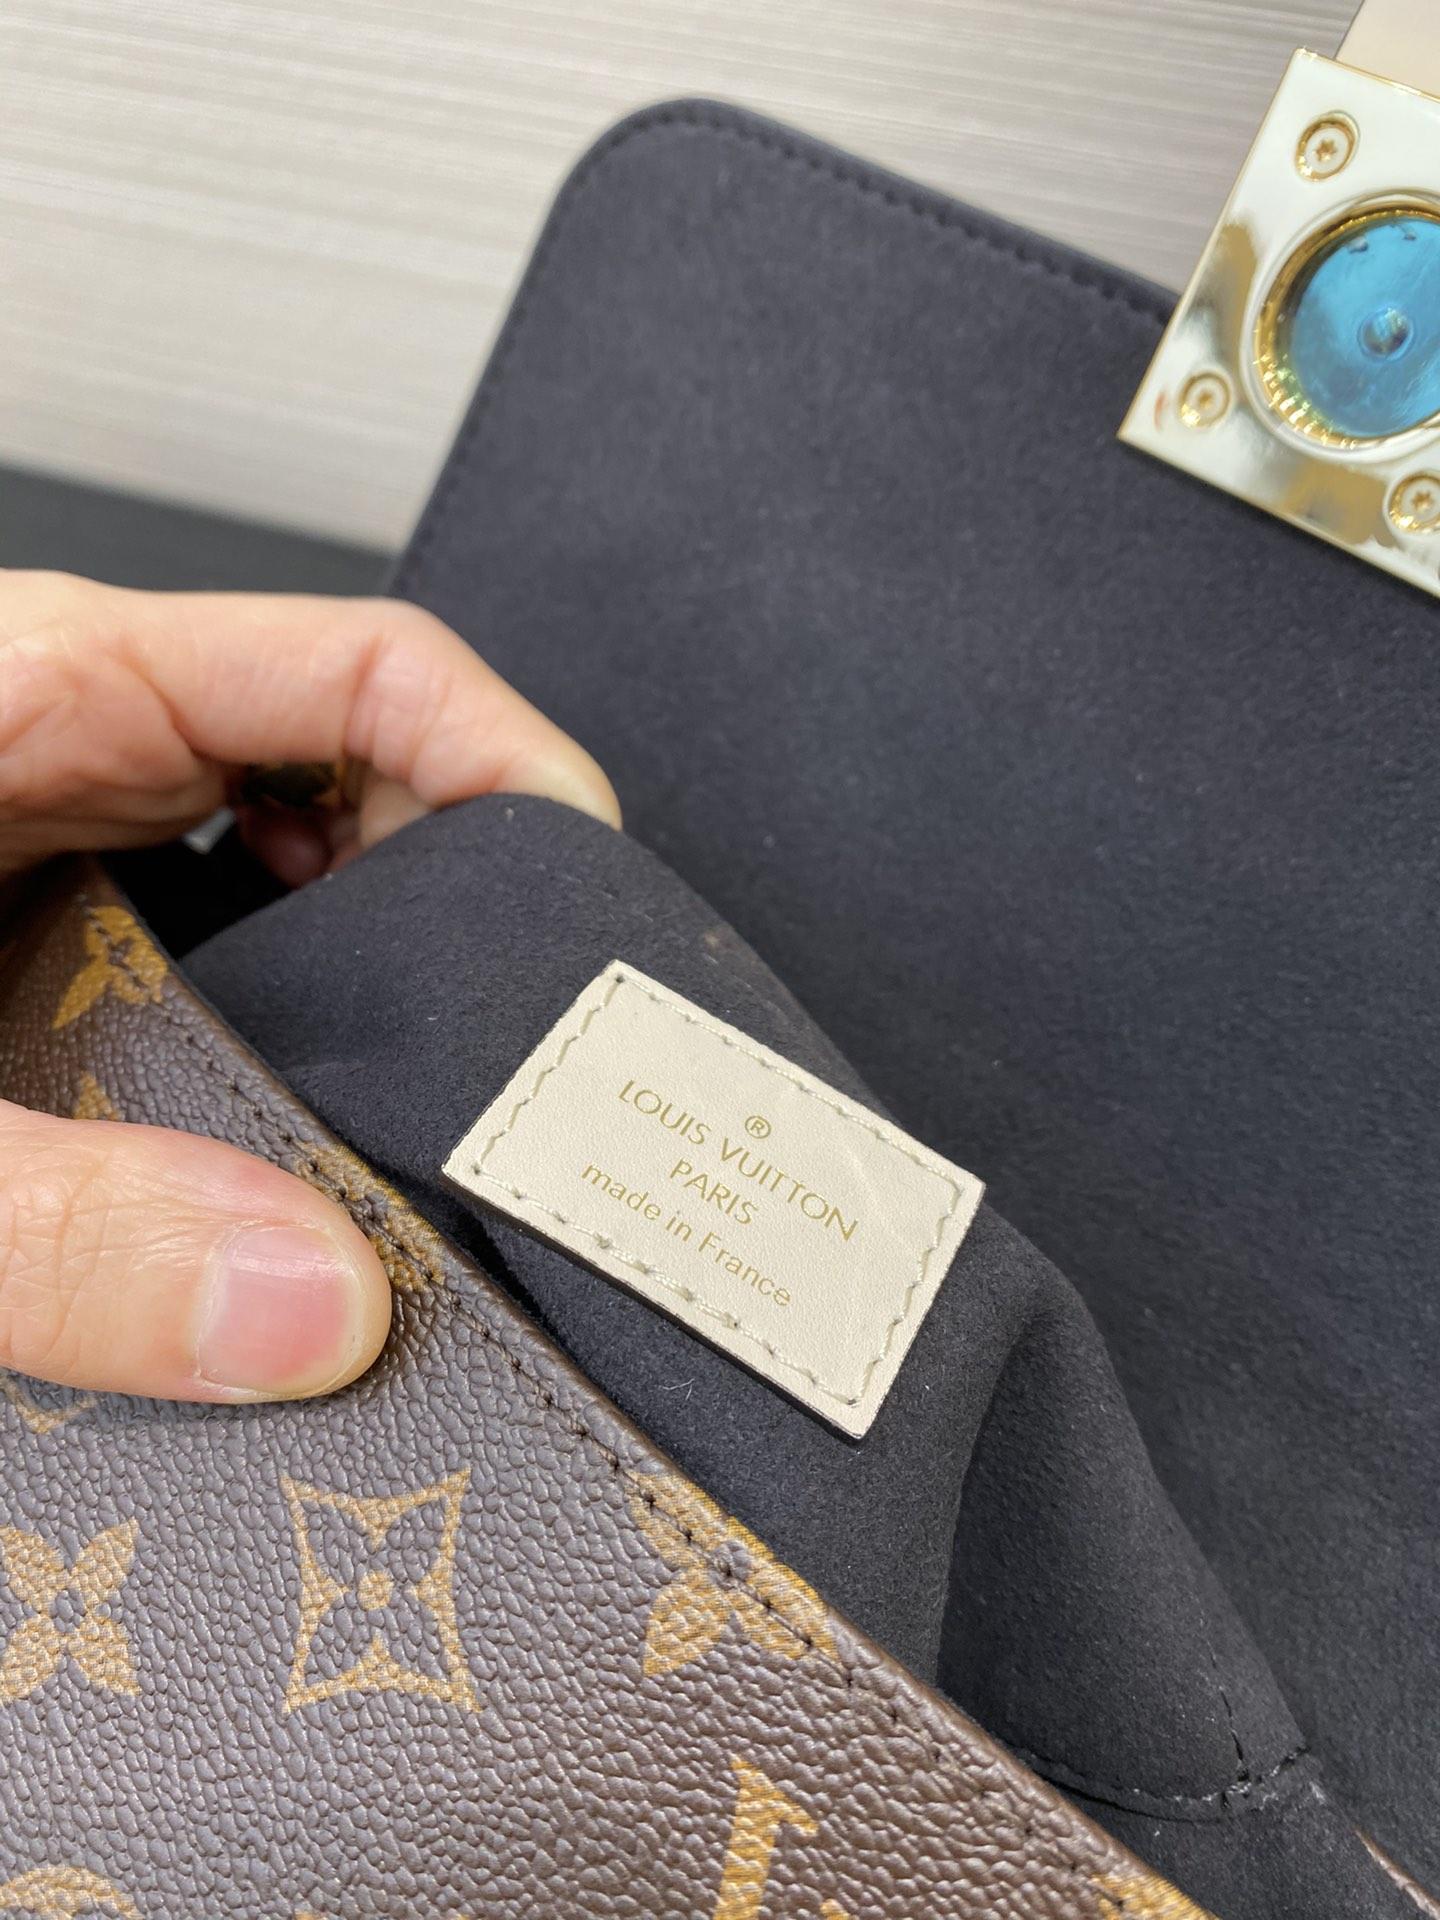 LV包包批发 最新Locky小邮差包44321 很有质感的五金锁 复古又耐看